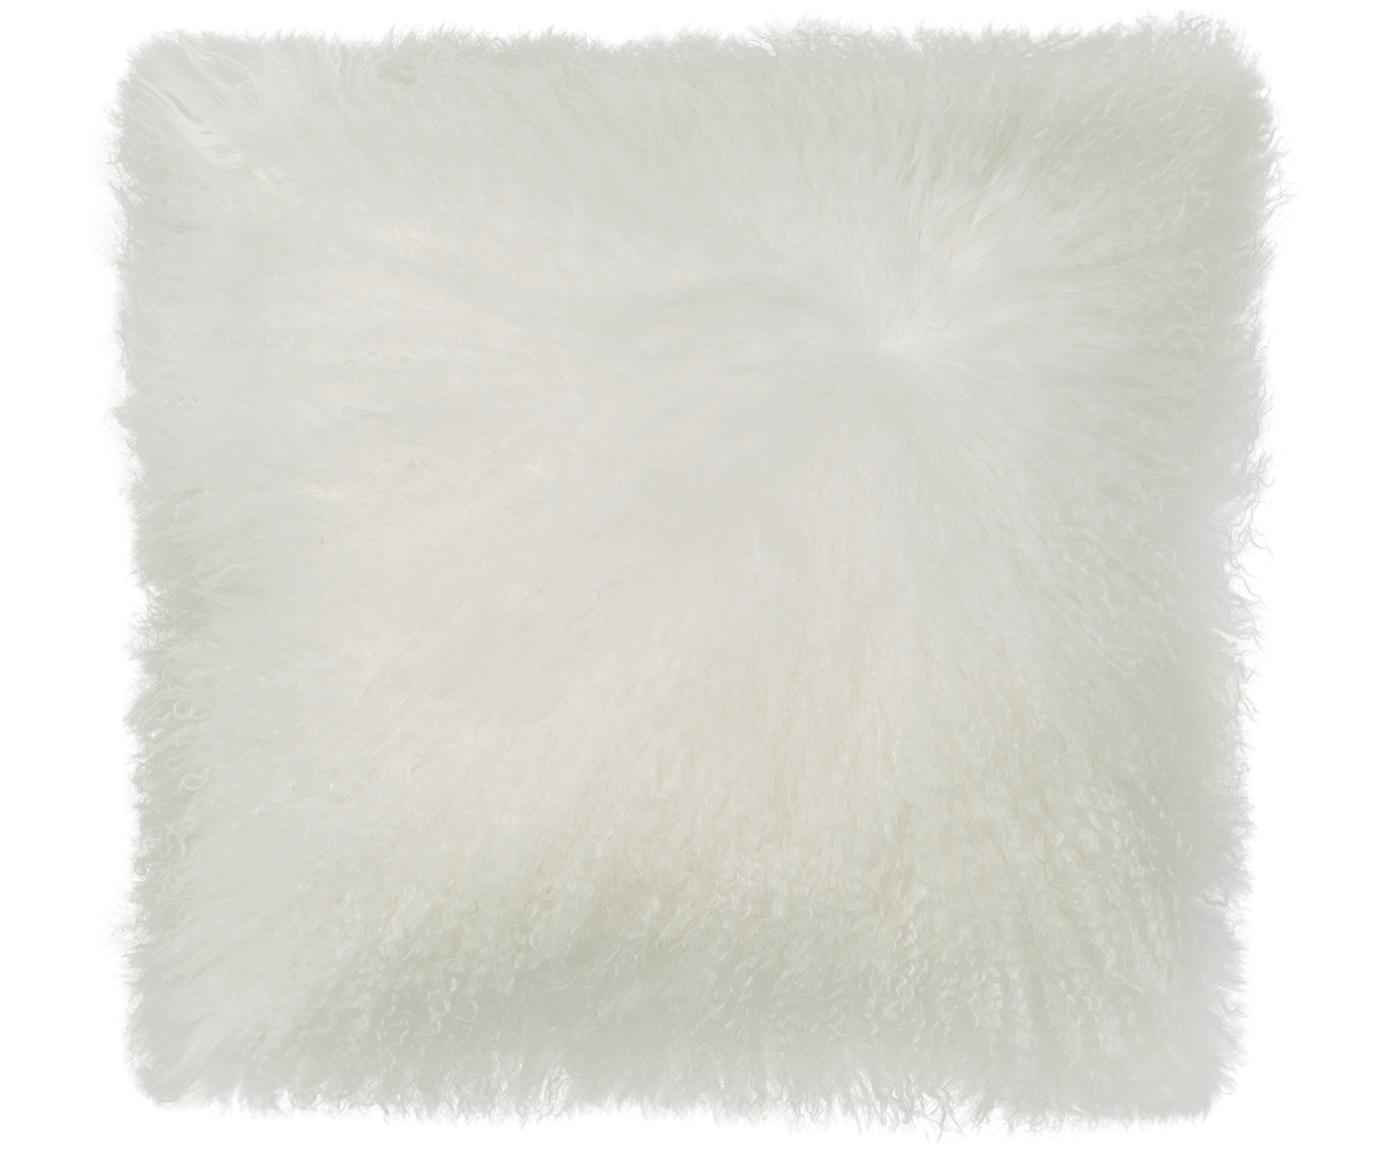 Langhaar-Lammfell Kissenhülle Ella, gelockt, Vorderseite: 100% mongolisches Lammfel, Rückseite: 100% Polyester, Weiss, 40 x 40 cm